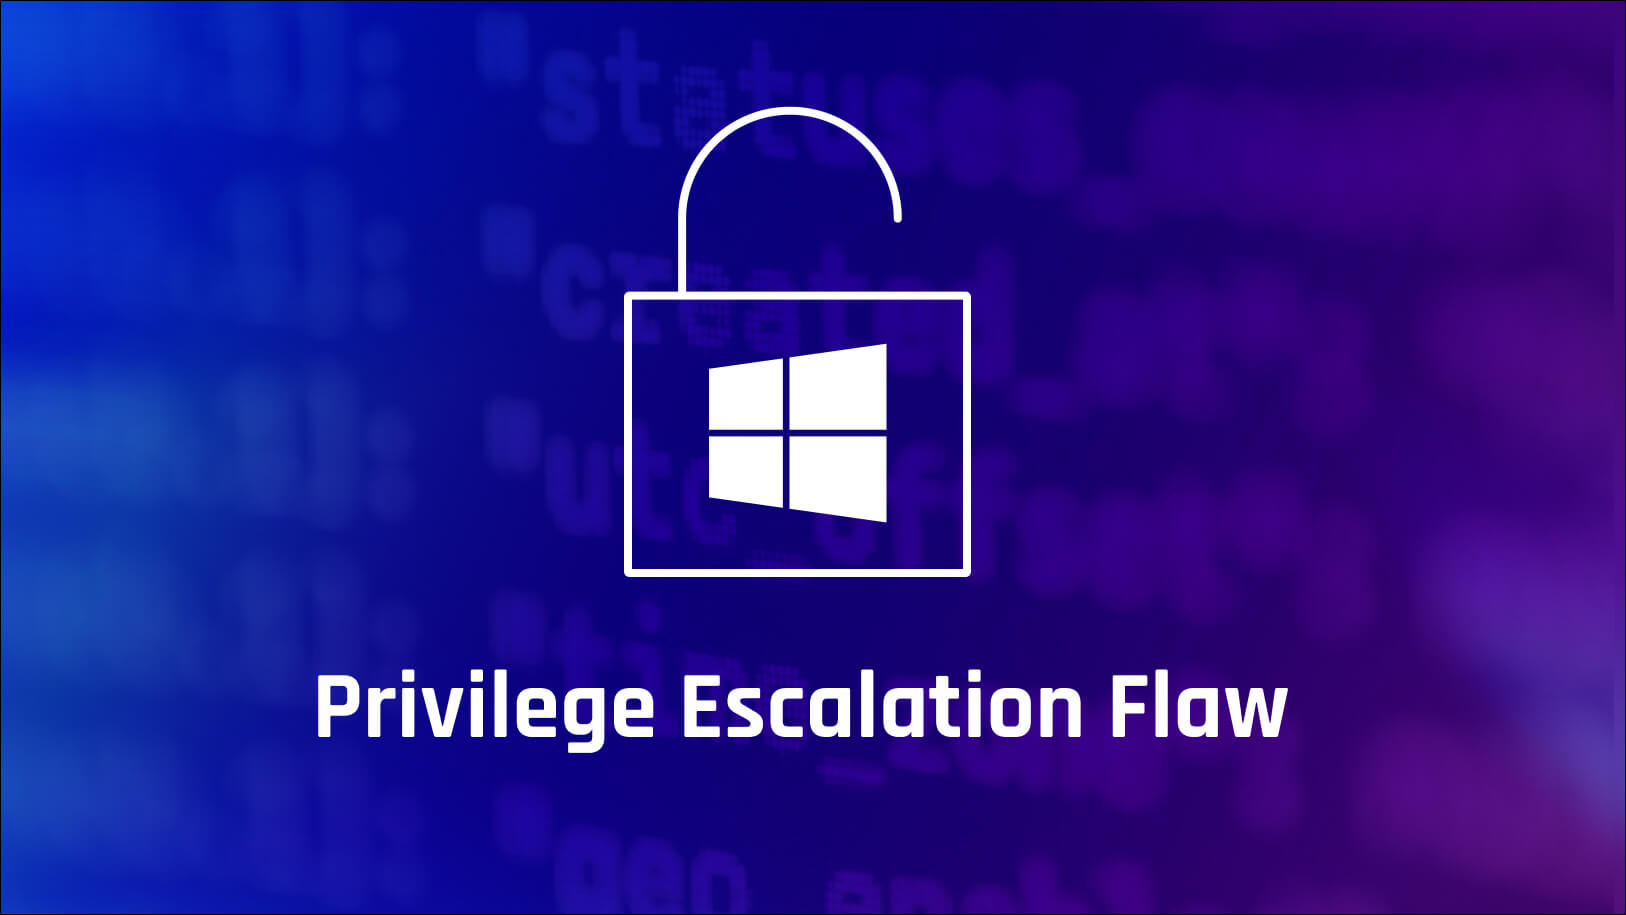 Privilege Escalation Flaw Underscores Need for Passwordless MFA